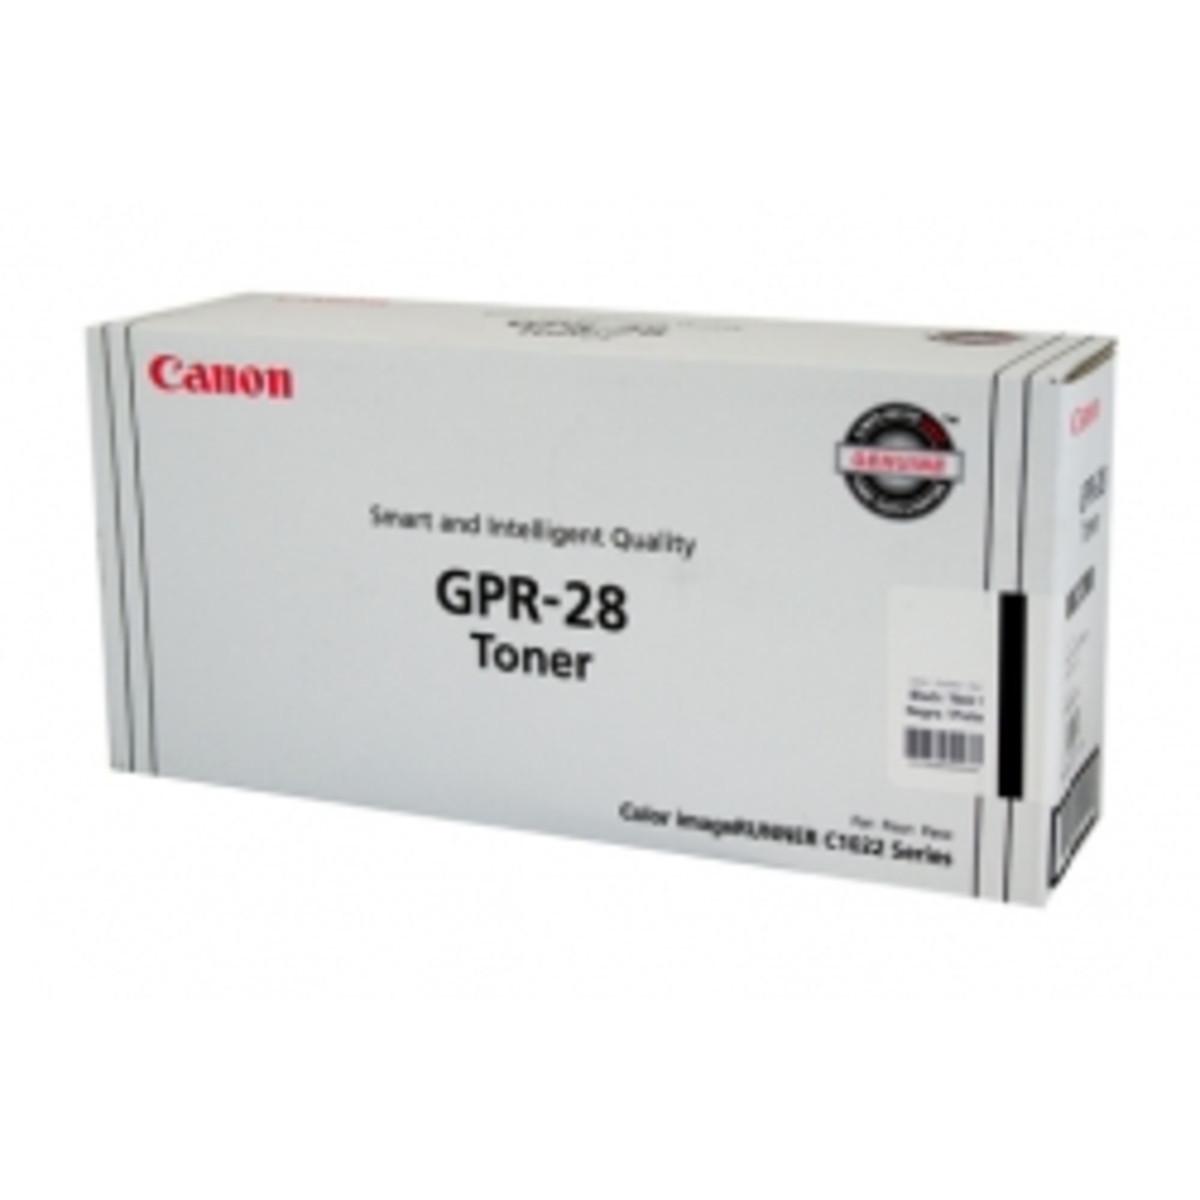 Canon GPR-28 Black Copier Cartridge